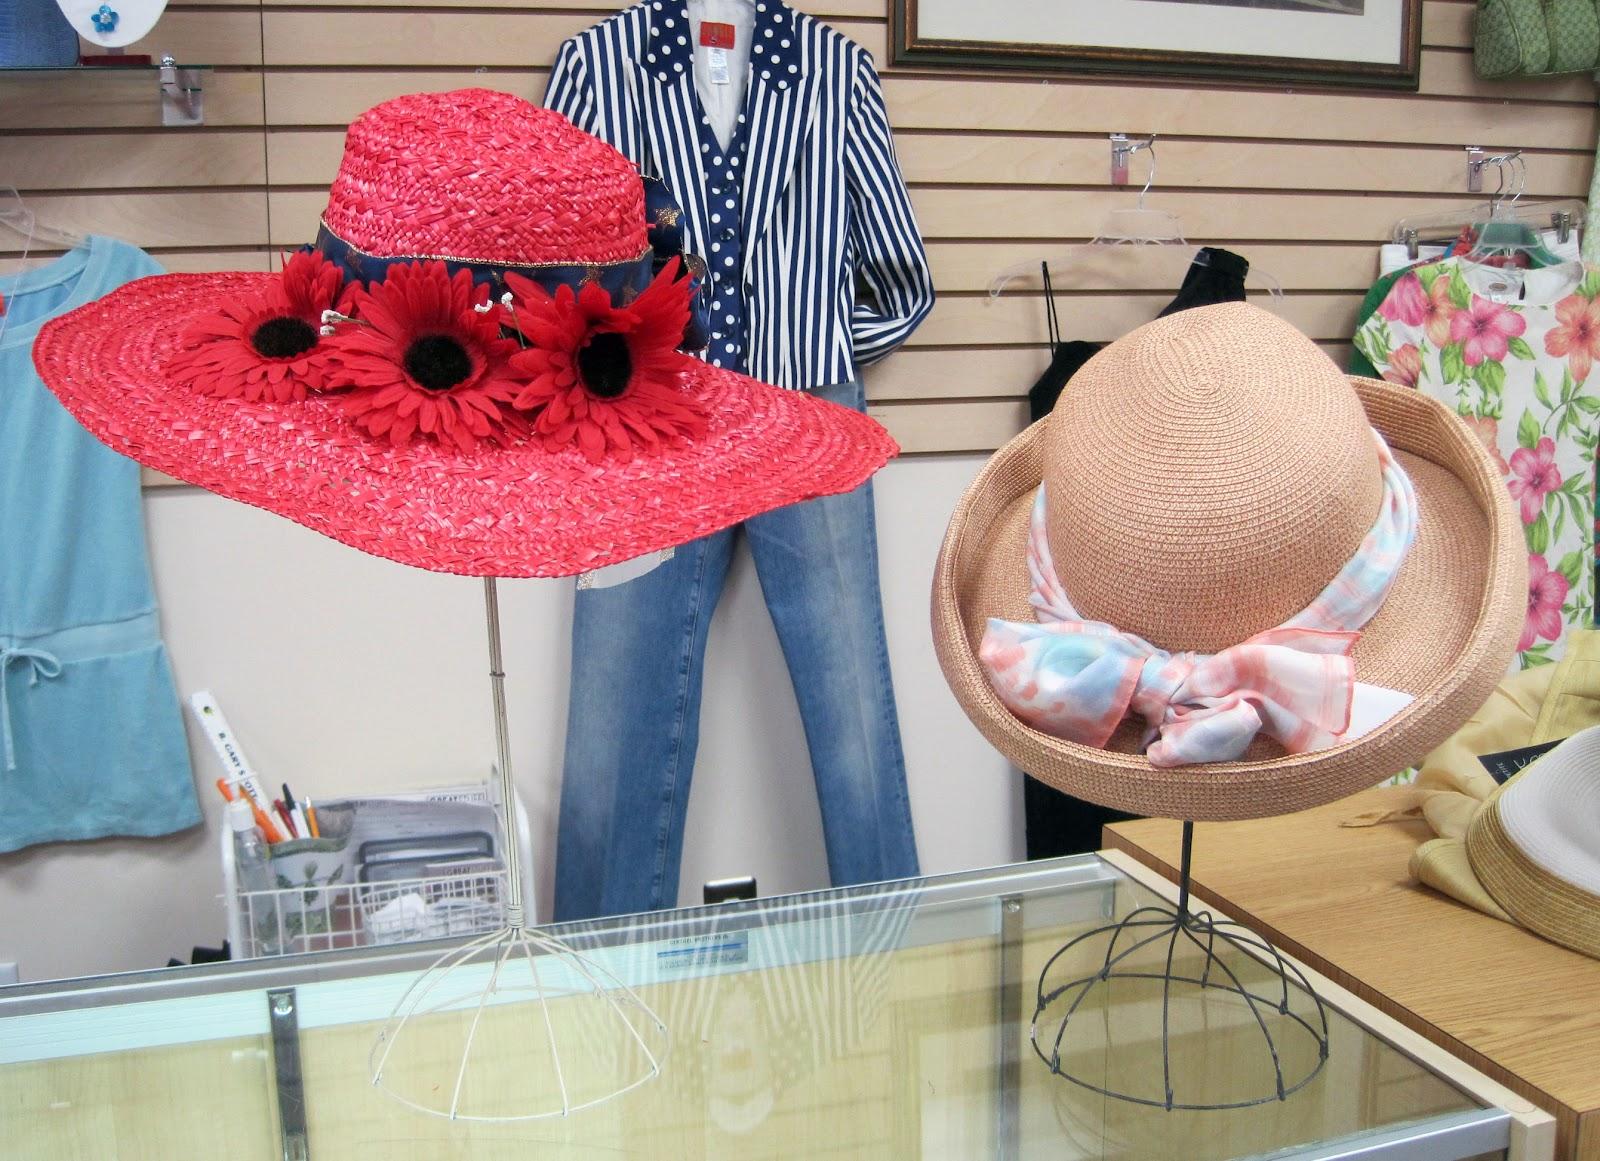 http://4.bp.blogspot.com/-M5WnheI6Gsk/T6BDvvDwz6I/AAAAAAAAAKo/paTu2vYoHko/s1600/Spring+hats.JPG